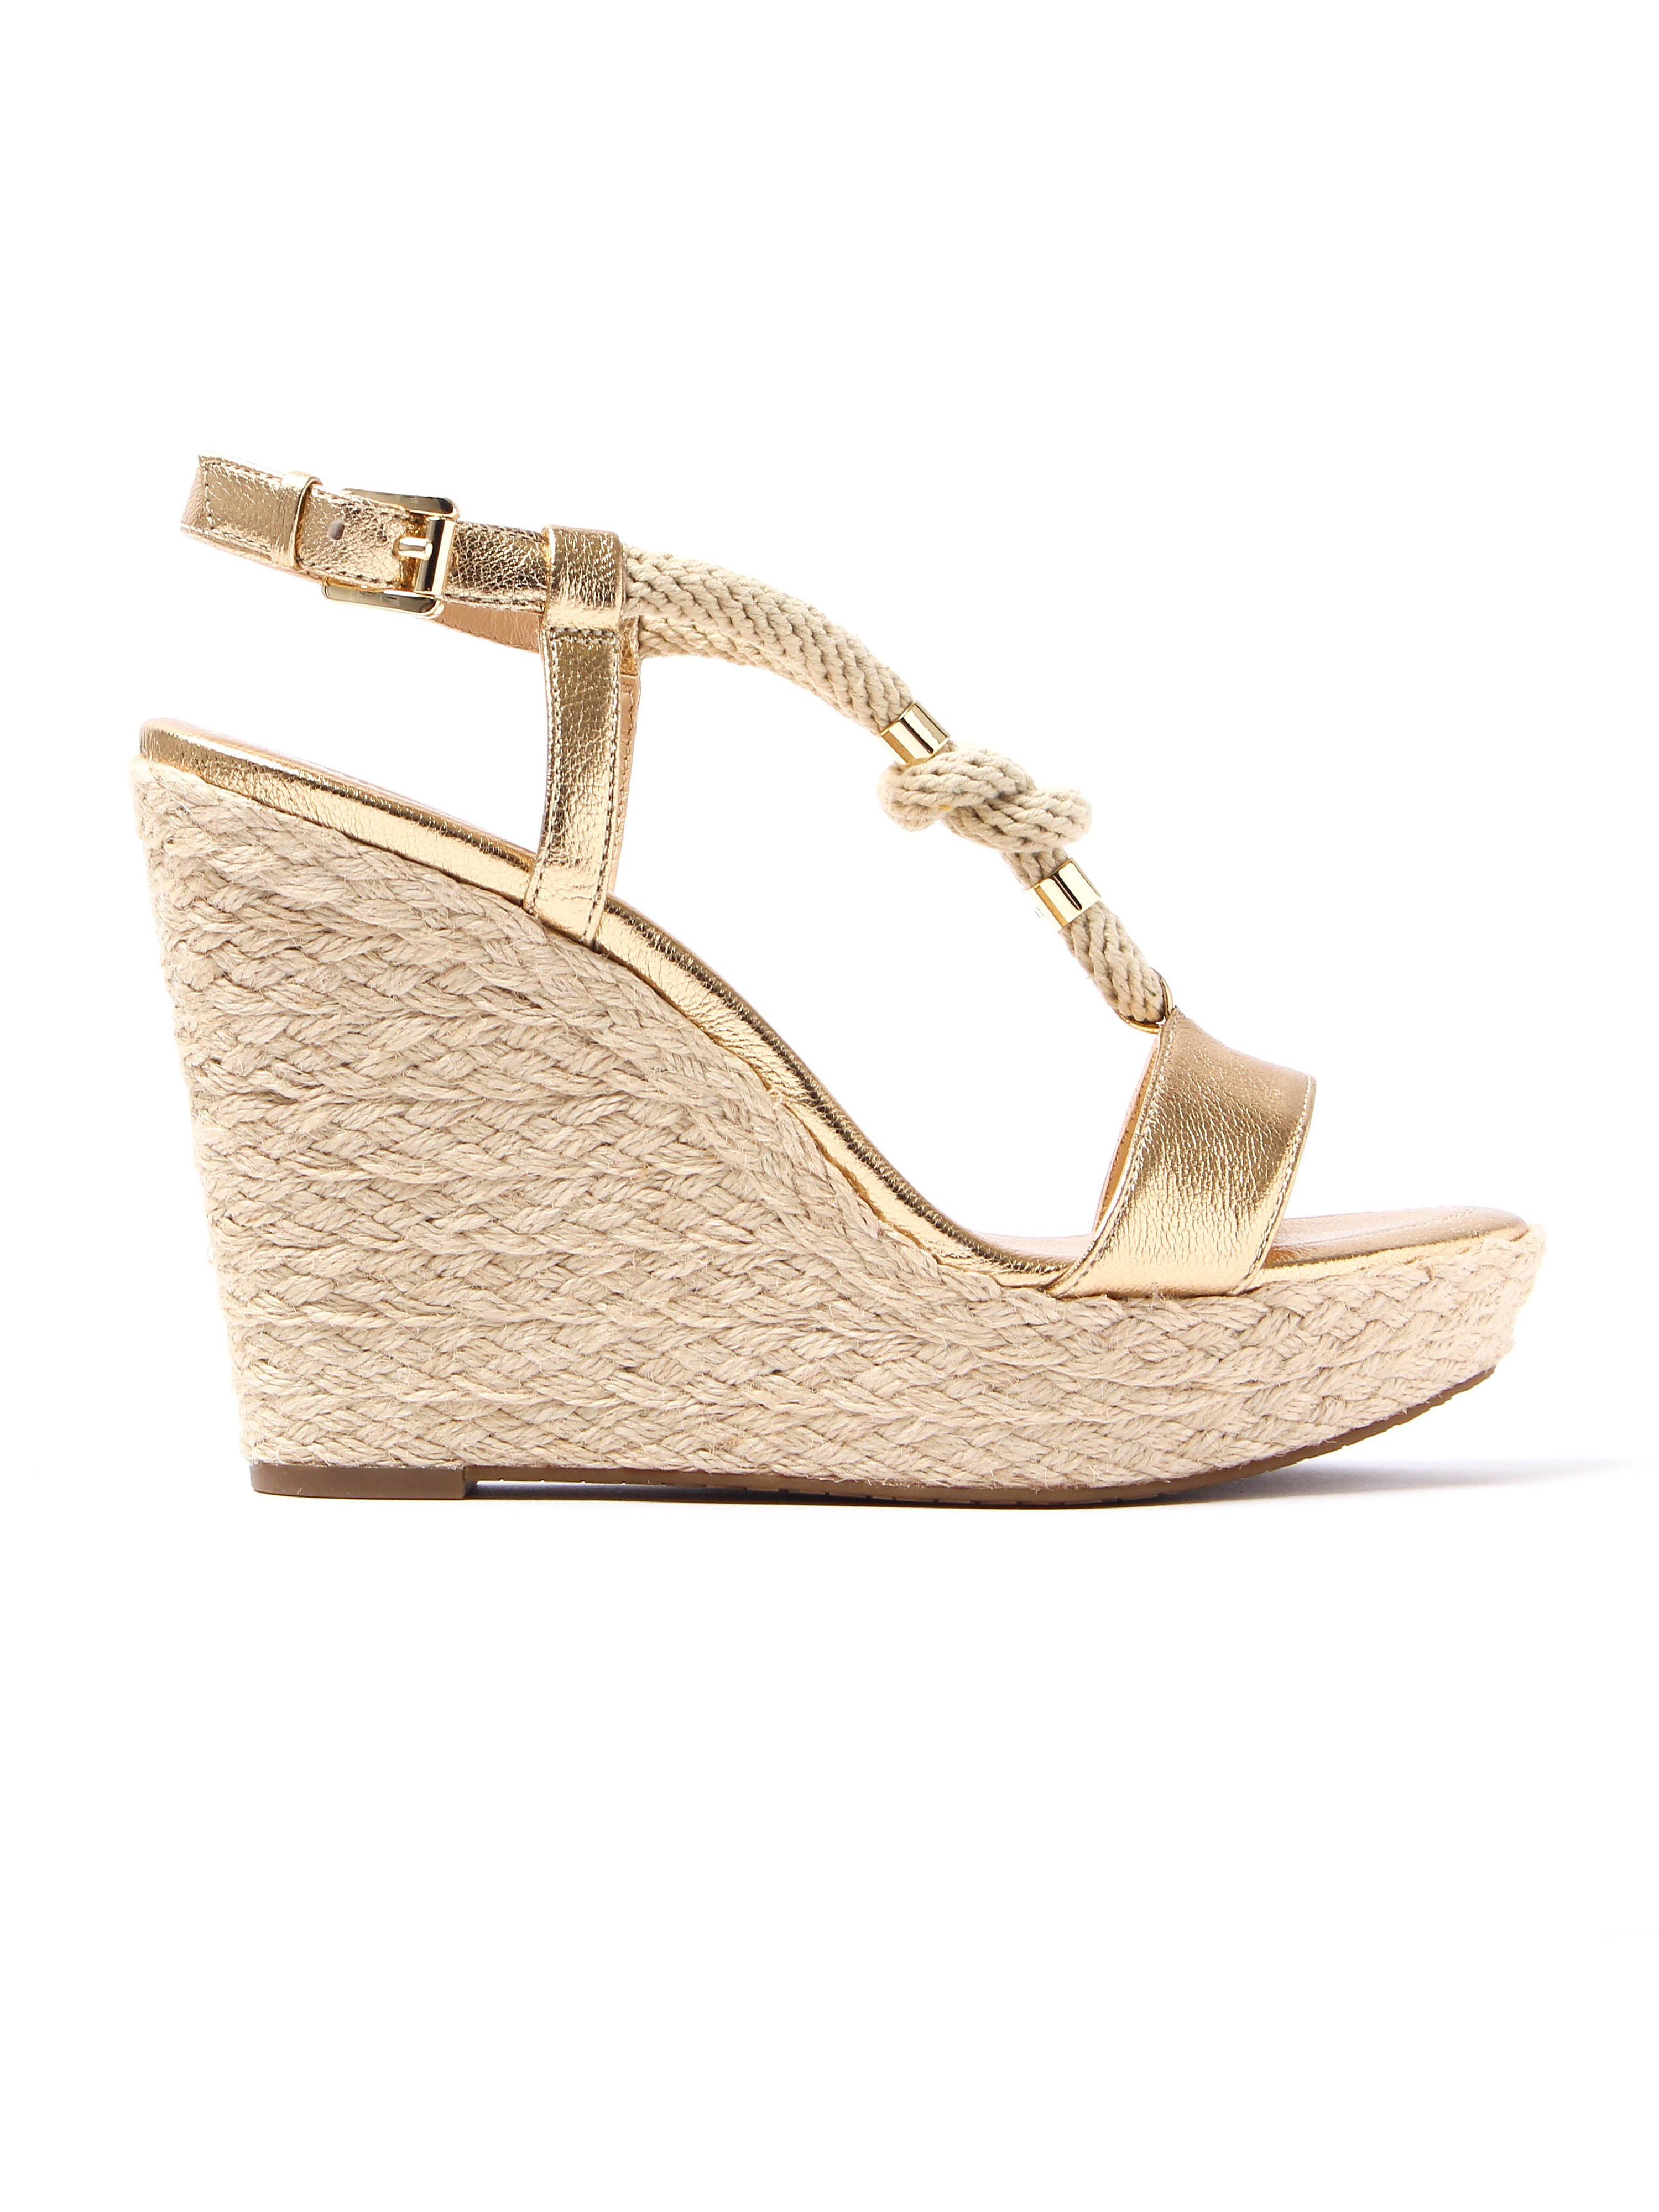 MICHAEL Michael Kors Women's Holly Rope-Trim Wedge Heels - Pale Gold